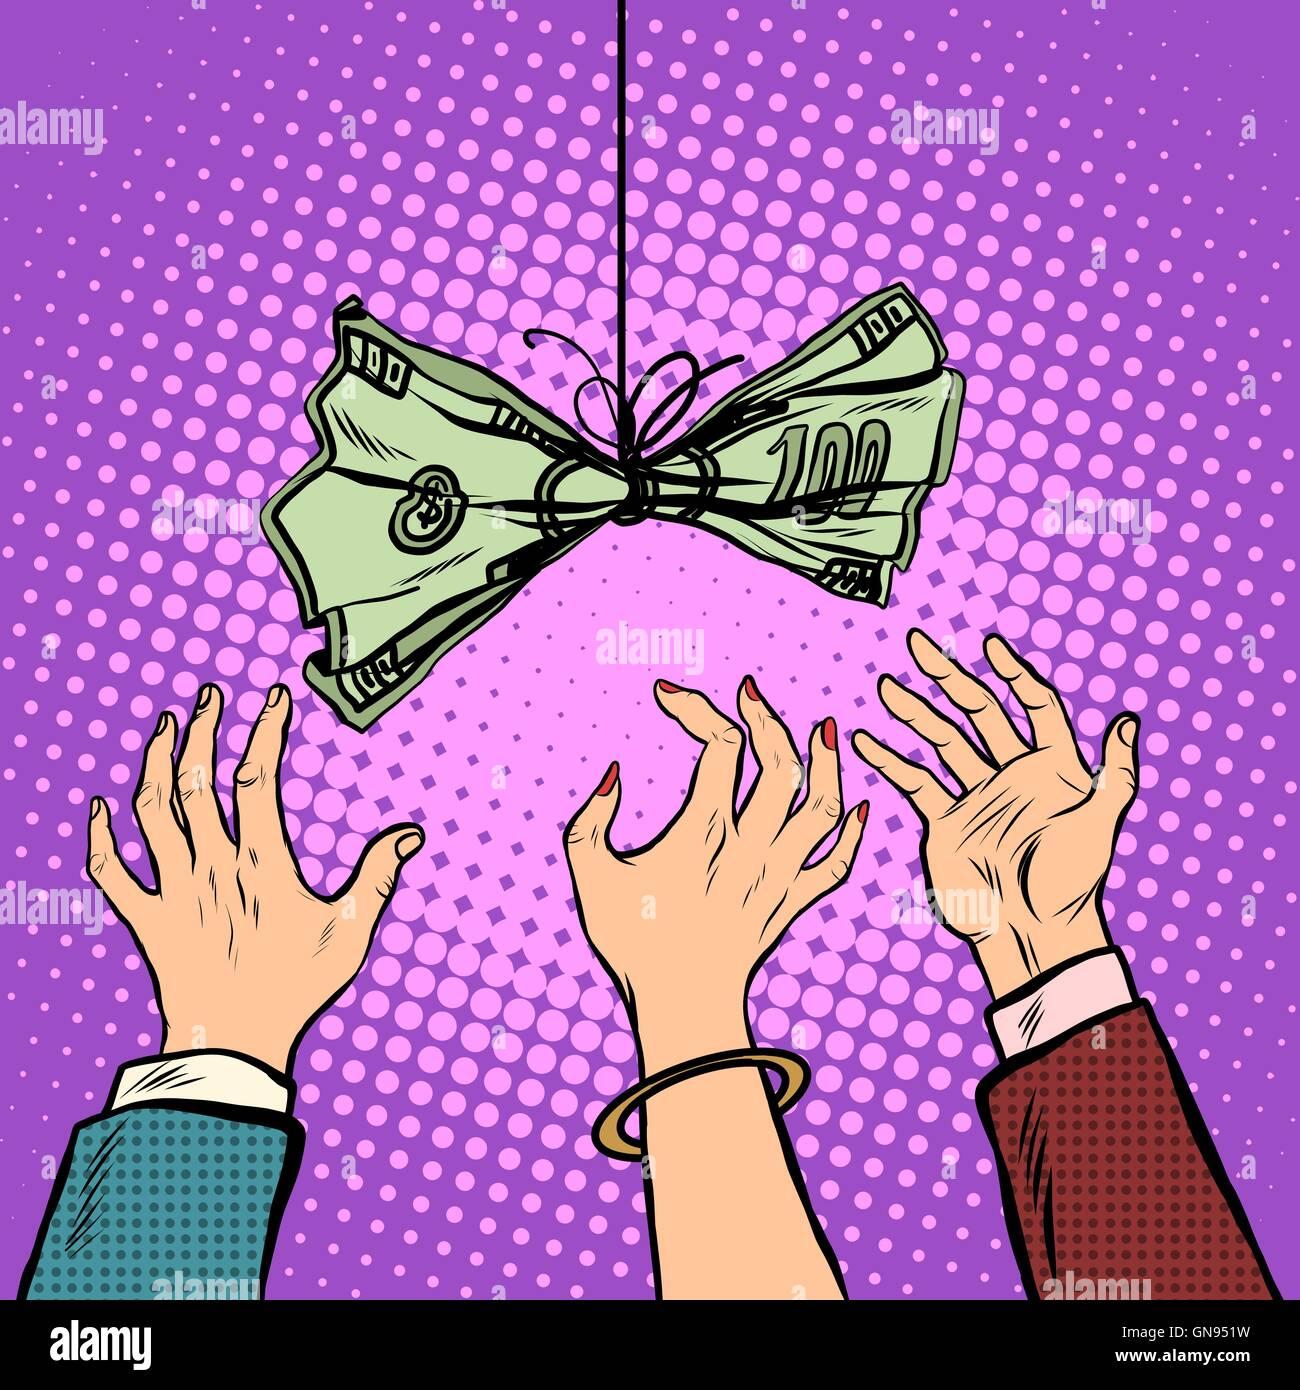 Cash bait vector retro illustration - Stock Image